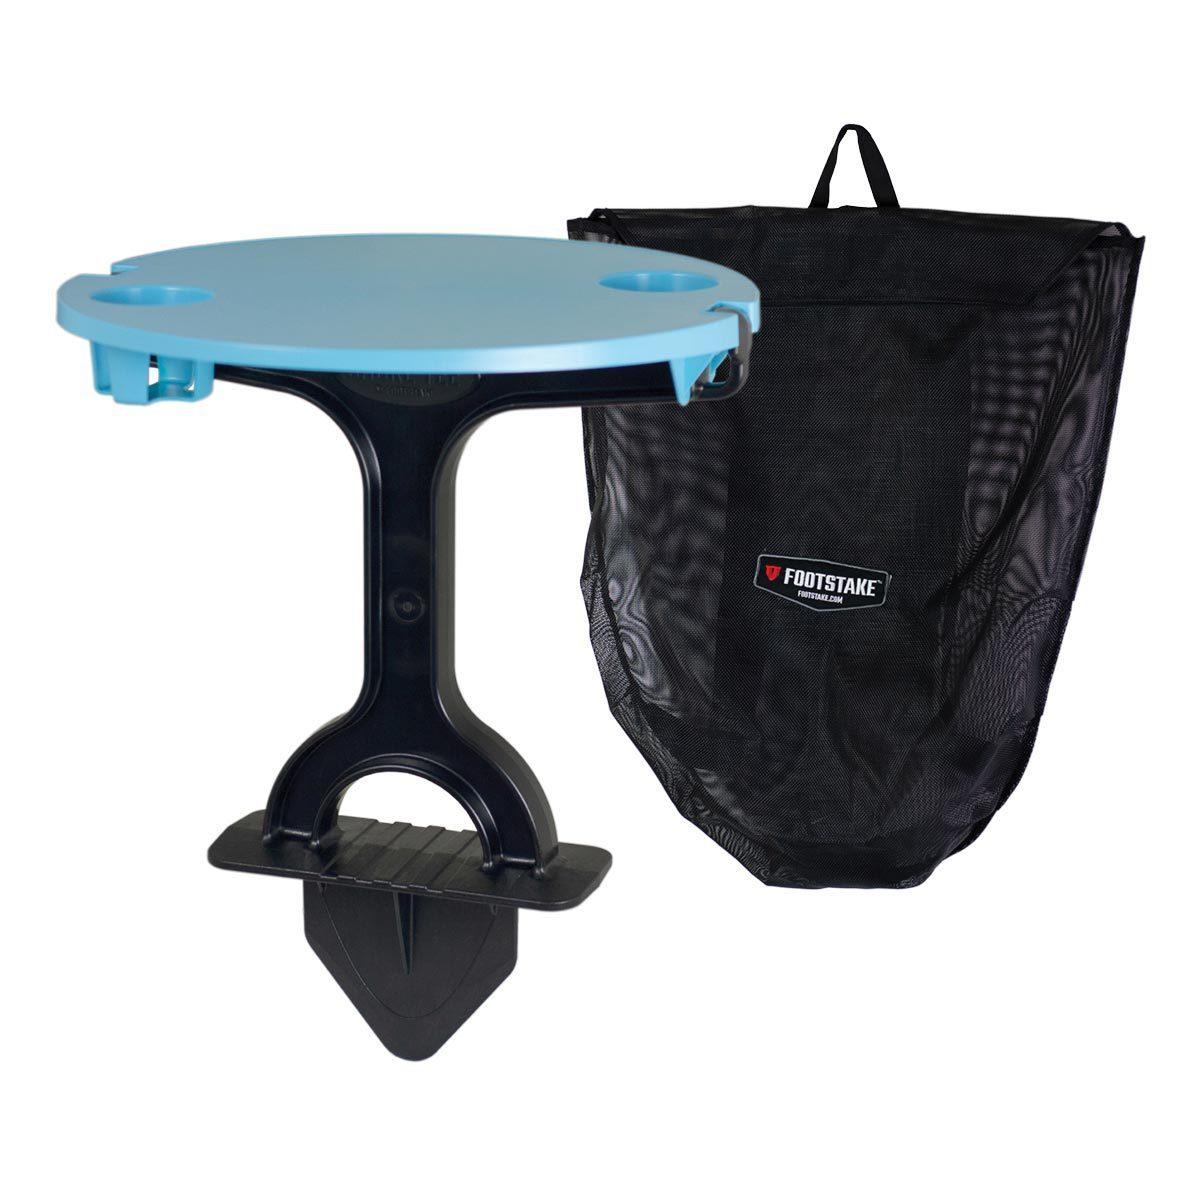 FootStake Tropical Blue Table AP432199